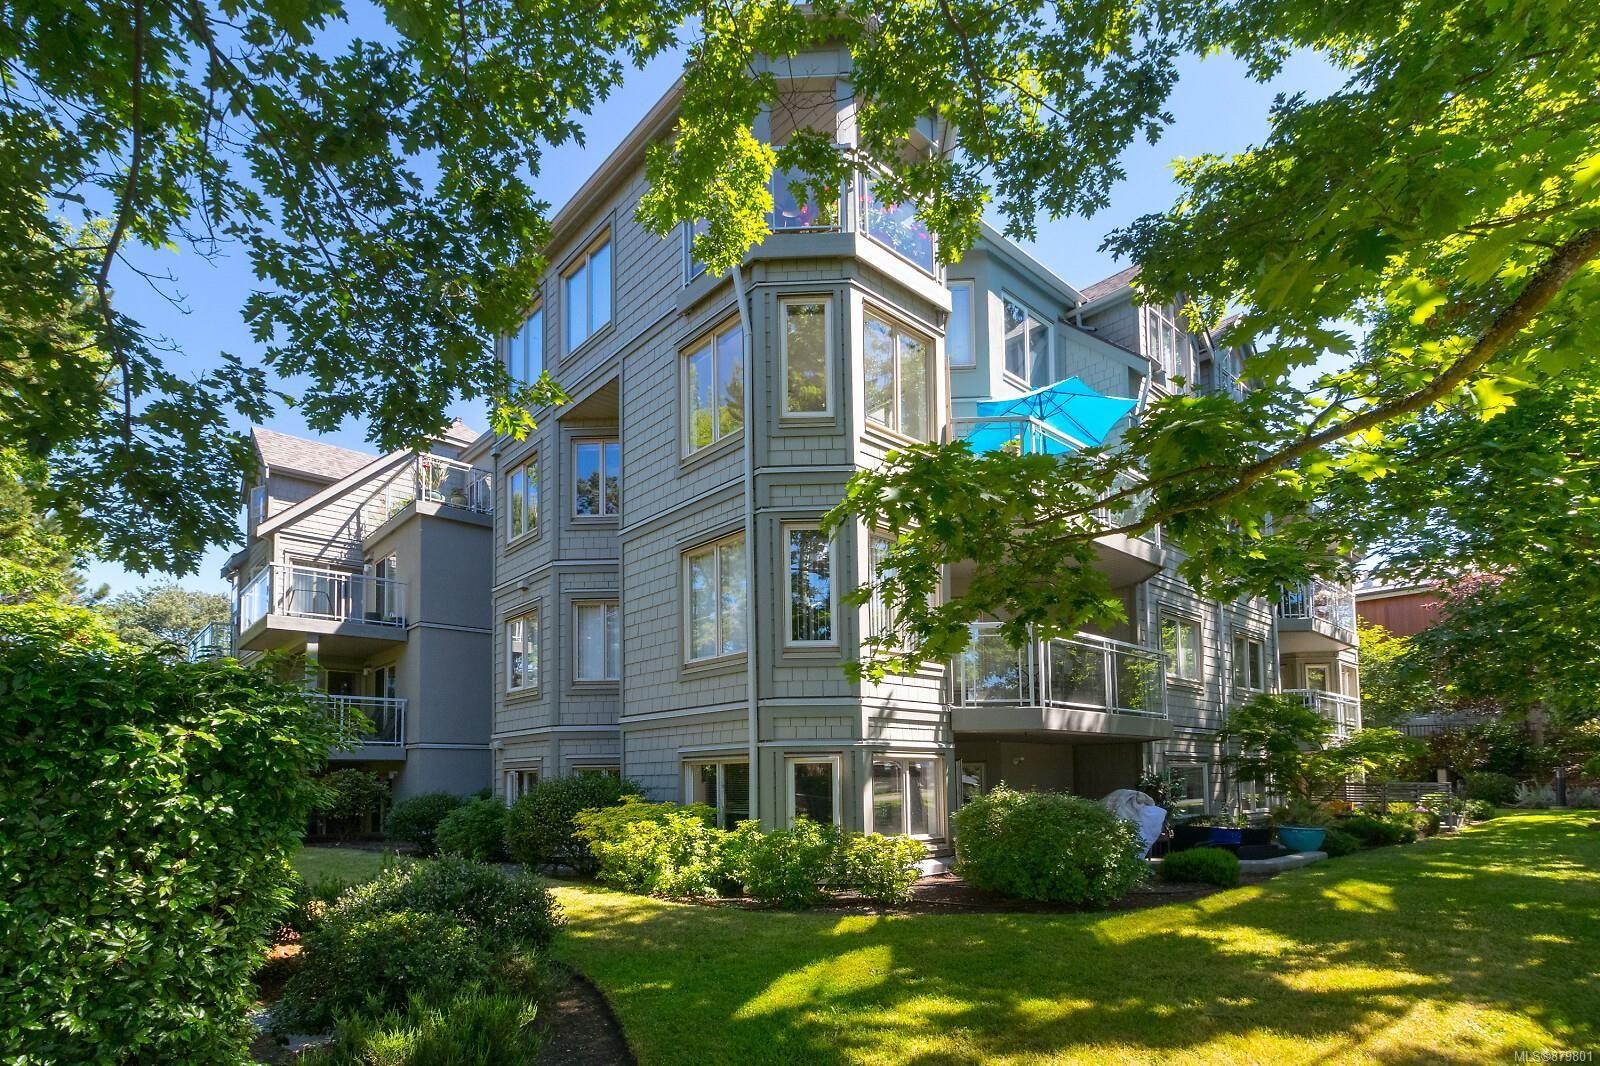 Main Photo: 304 1687 Poplar Ave in : SE Mt Tolmie Condo for sale (Saanich East)  : MLS®# 879801